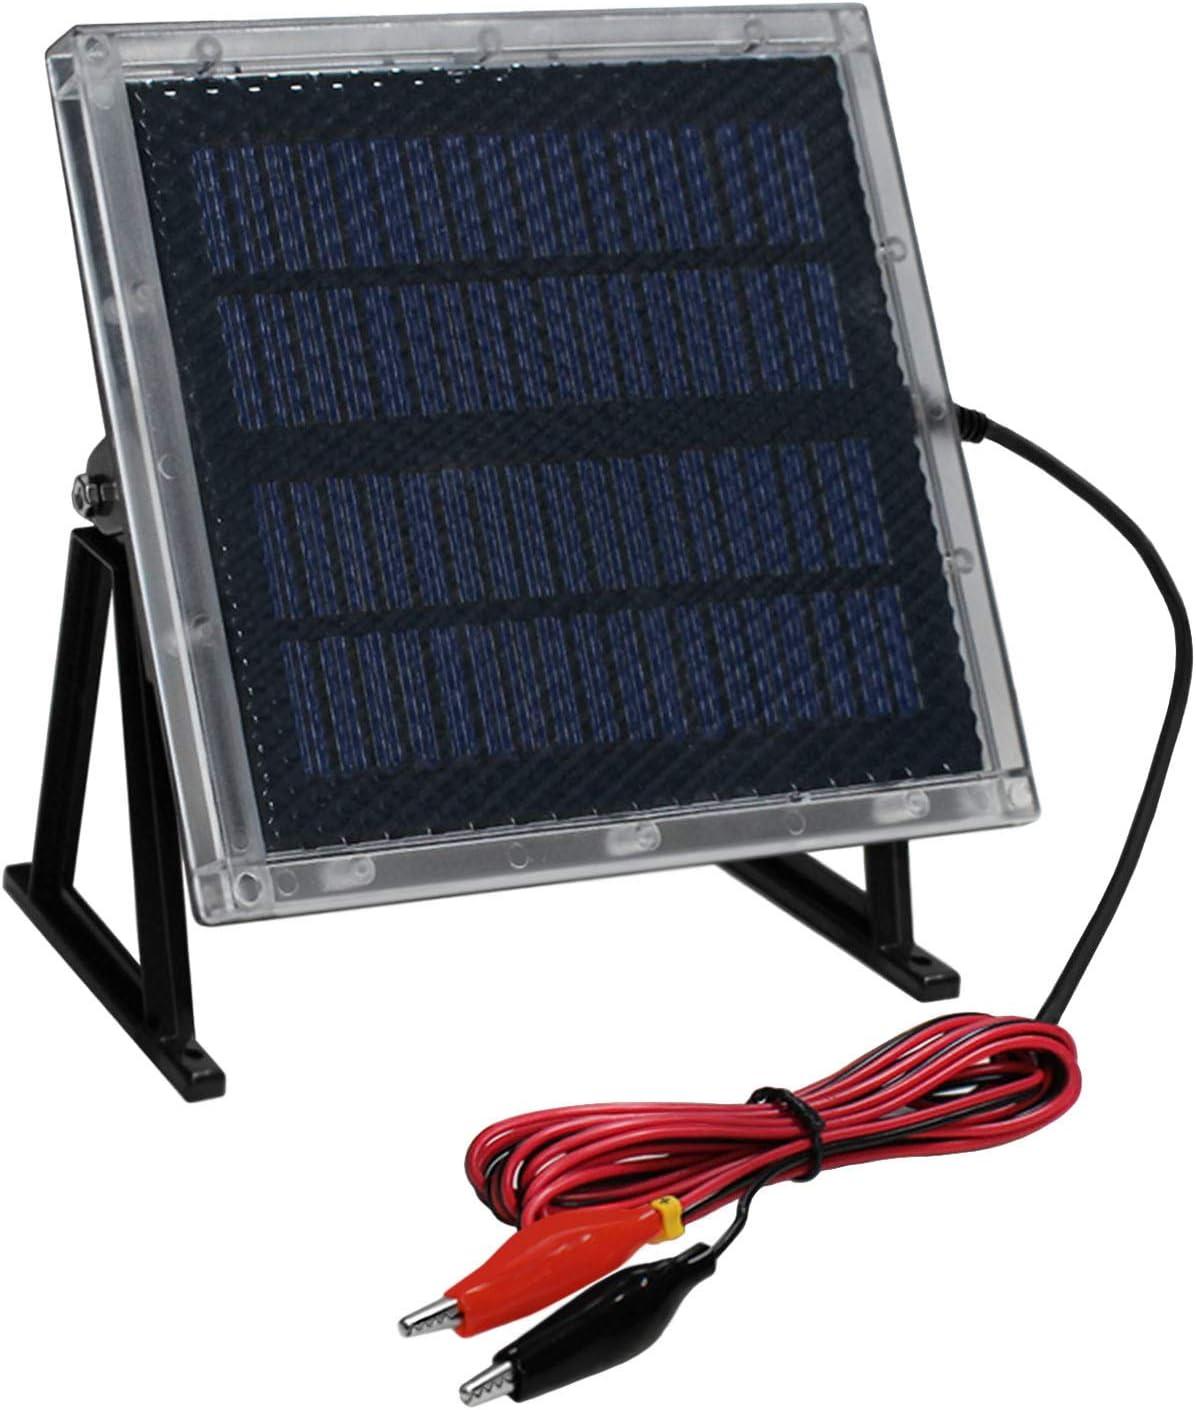 Universal Power Group 12-Volt Solar Panel Charger for 12V 7Ah APC Smart-UPS SC 1000VA Battery